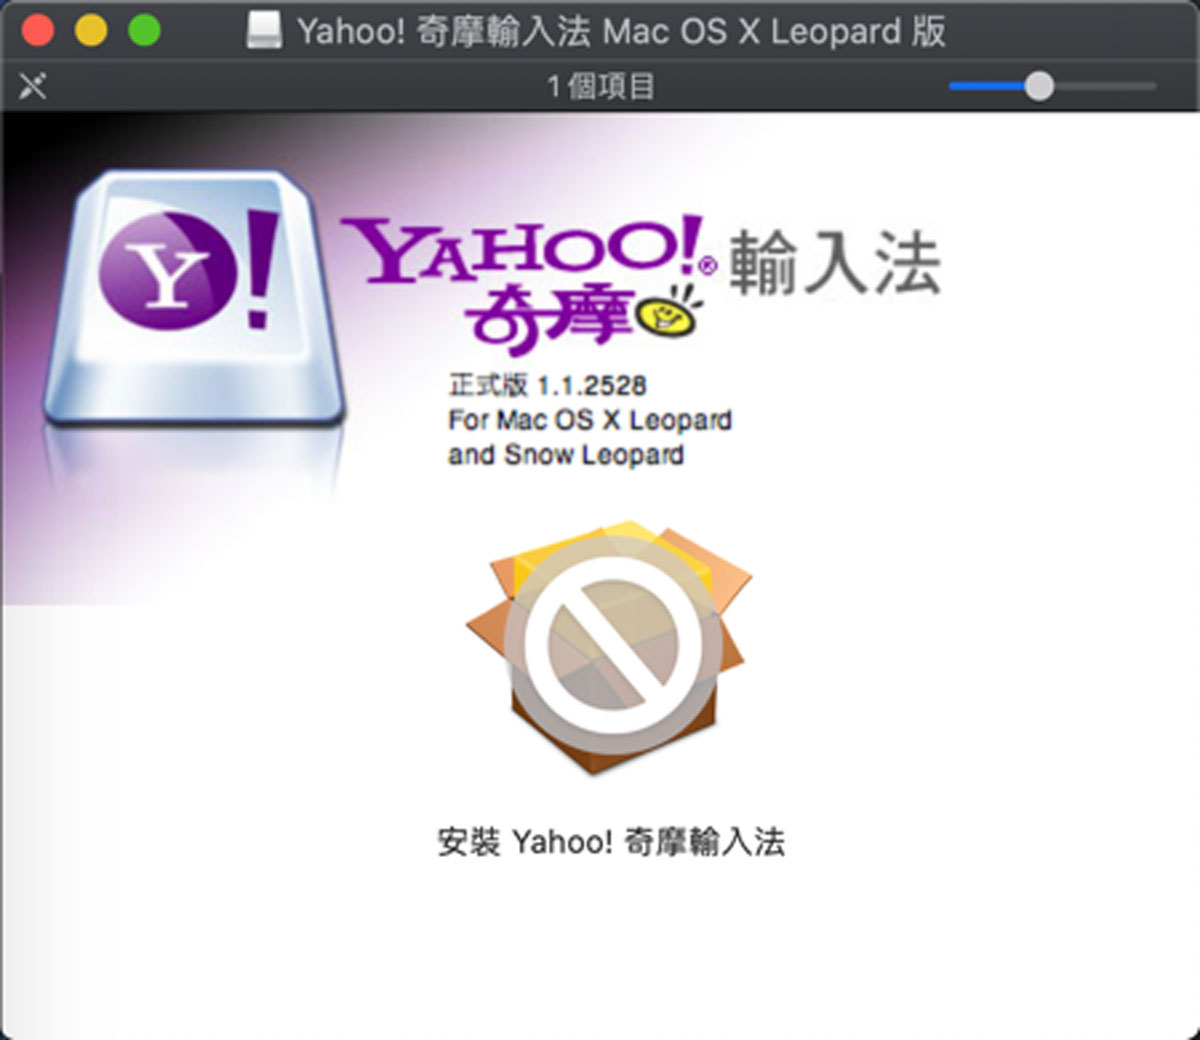 Yahoo 輸入法 64bit 安裝檔